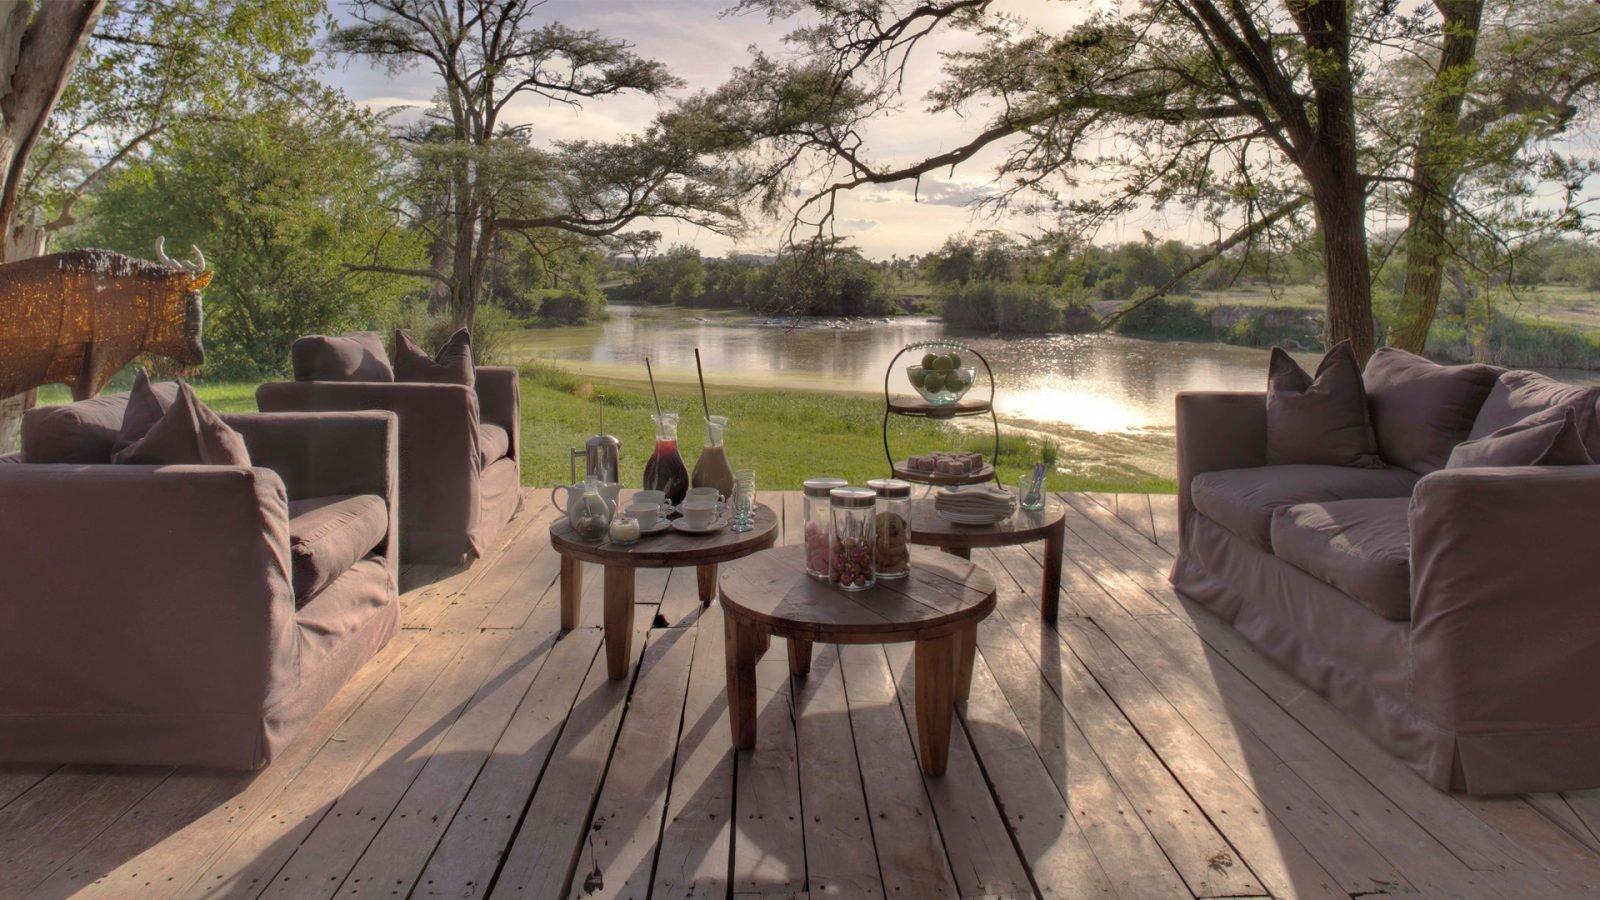 andBeyond Grumet River Camp